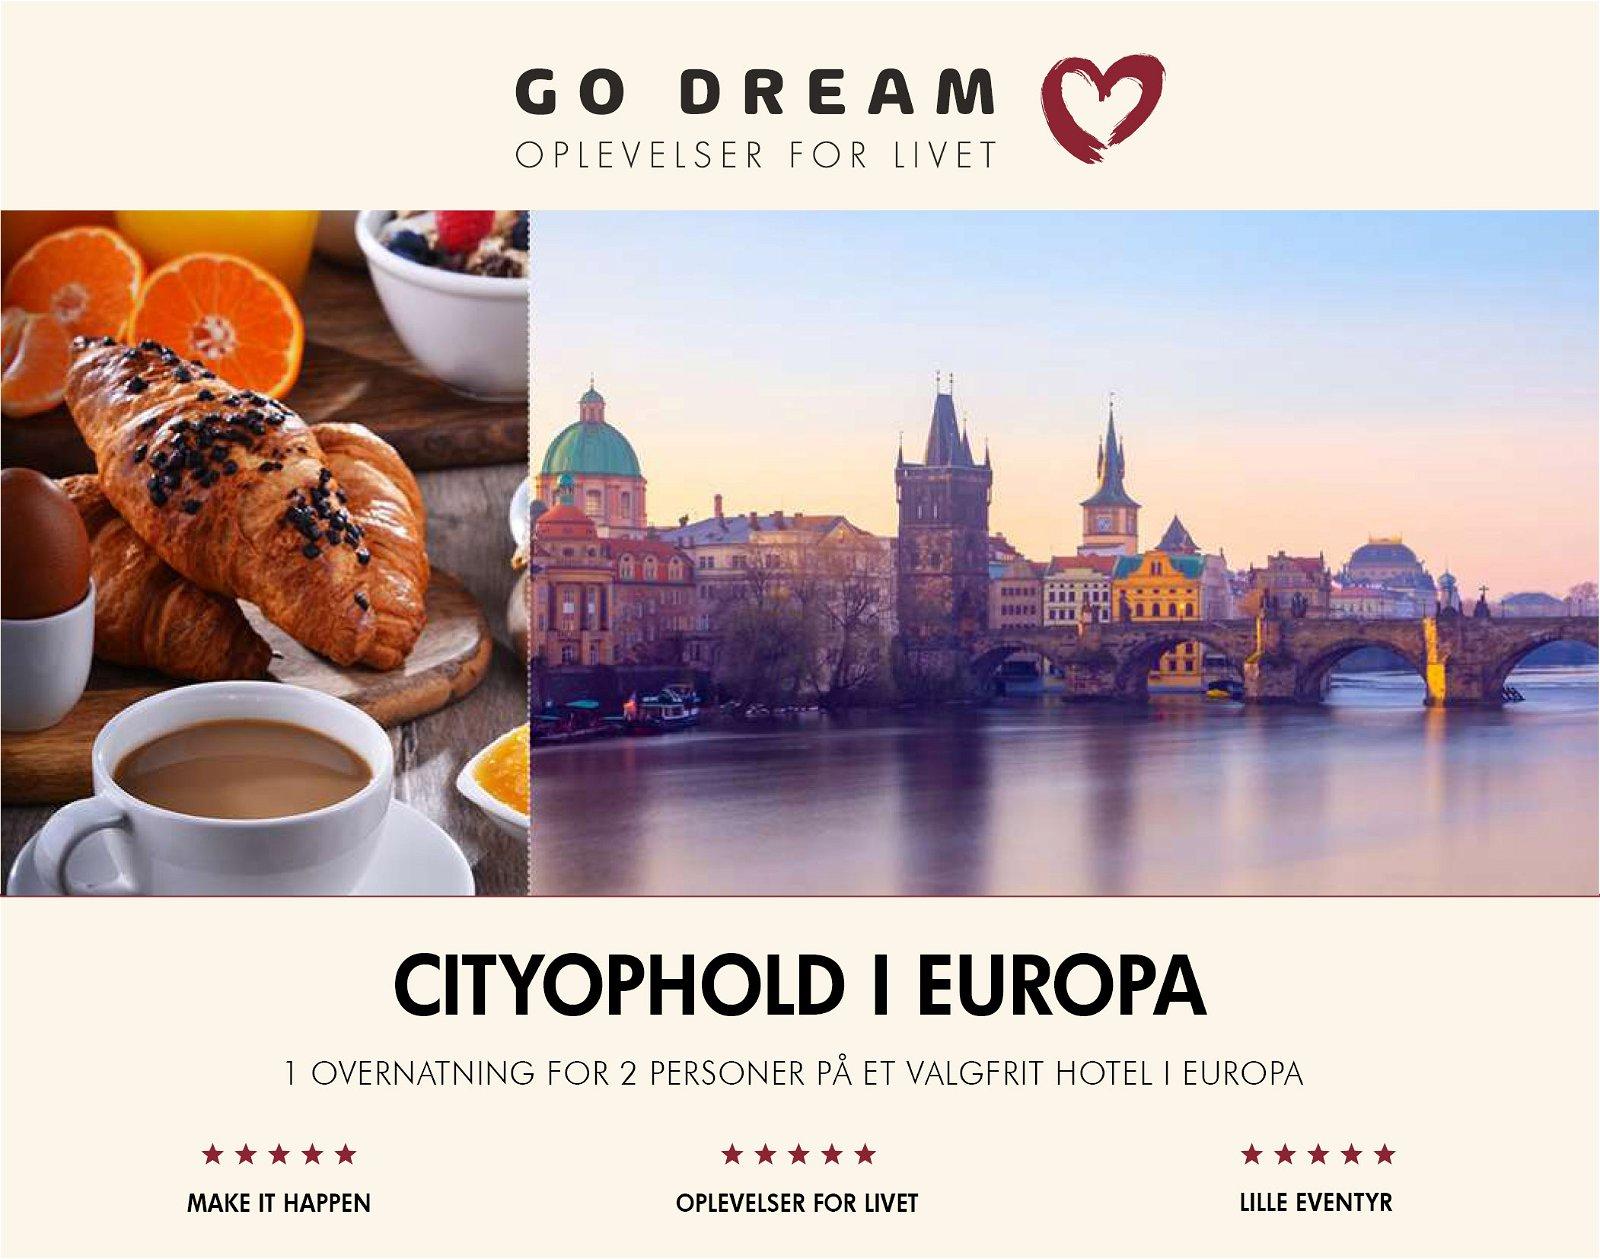 Go Dream Cityophold i Europa